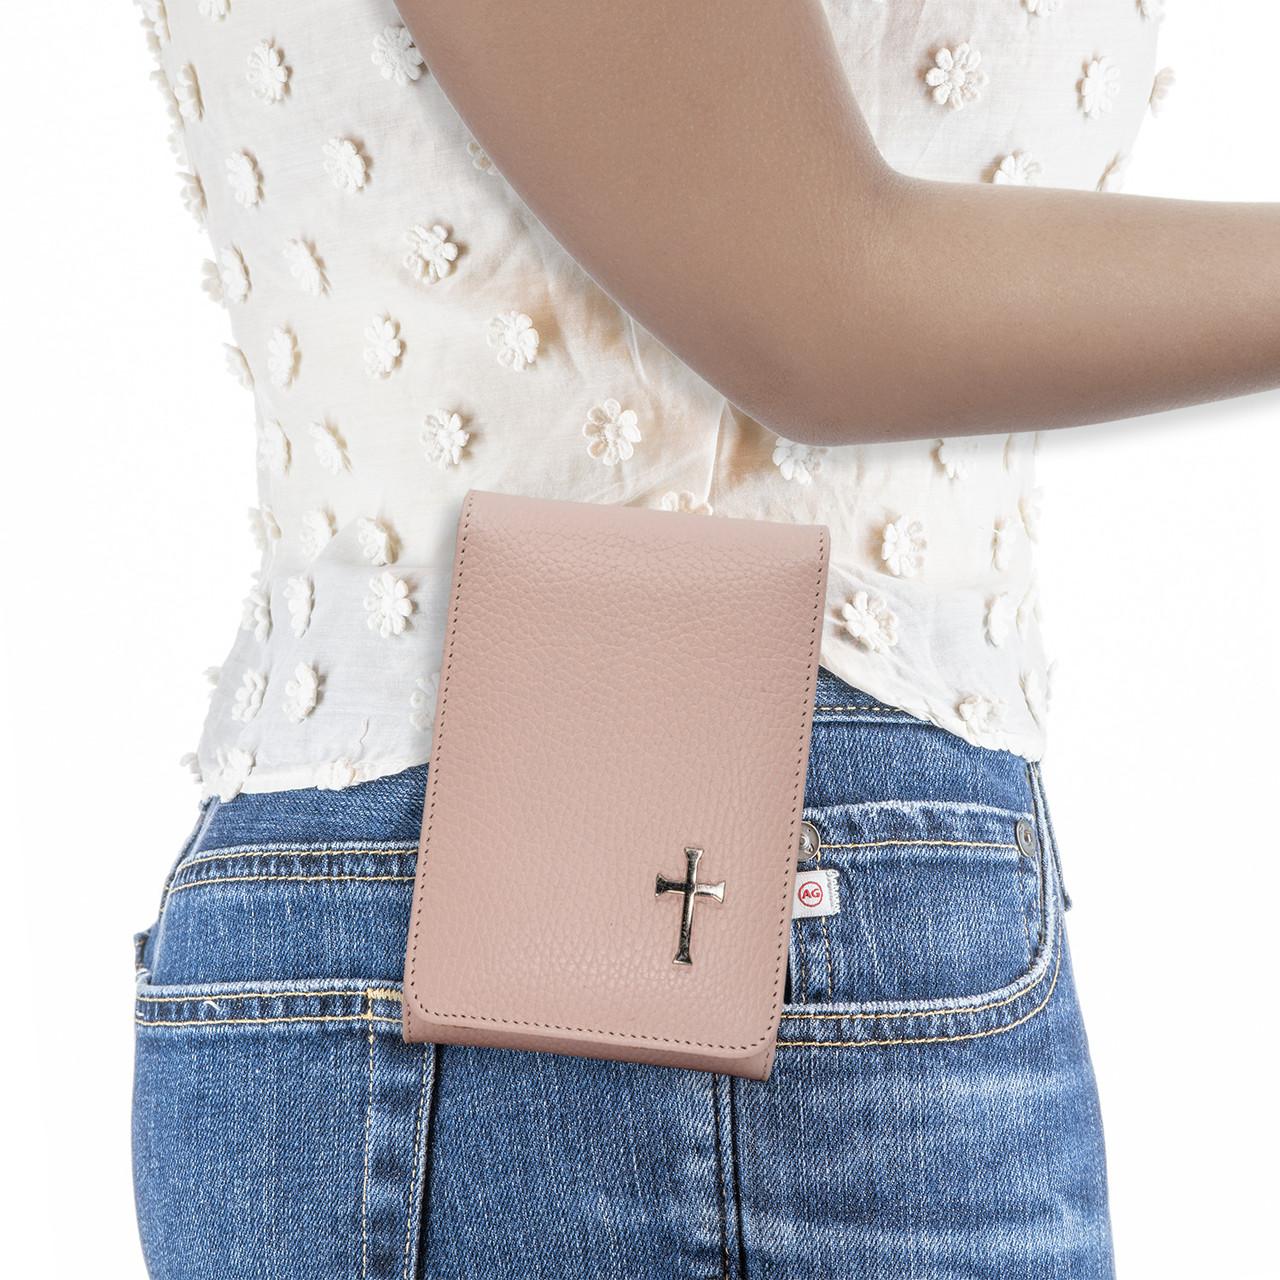 Sig P365 XL Pink Carry Faithfully Cross Holster